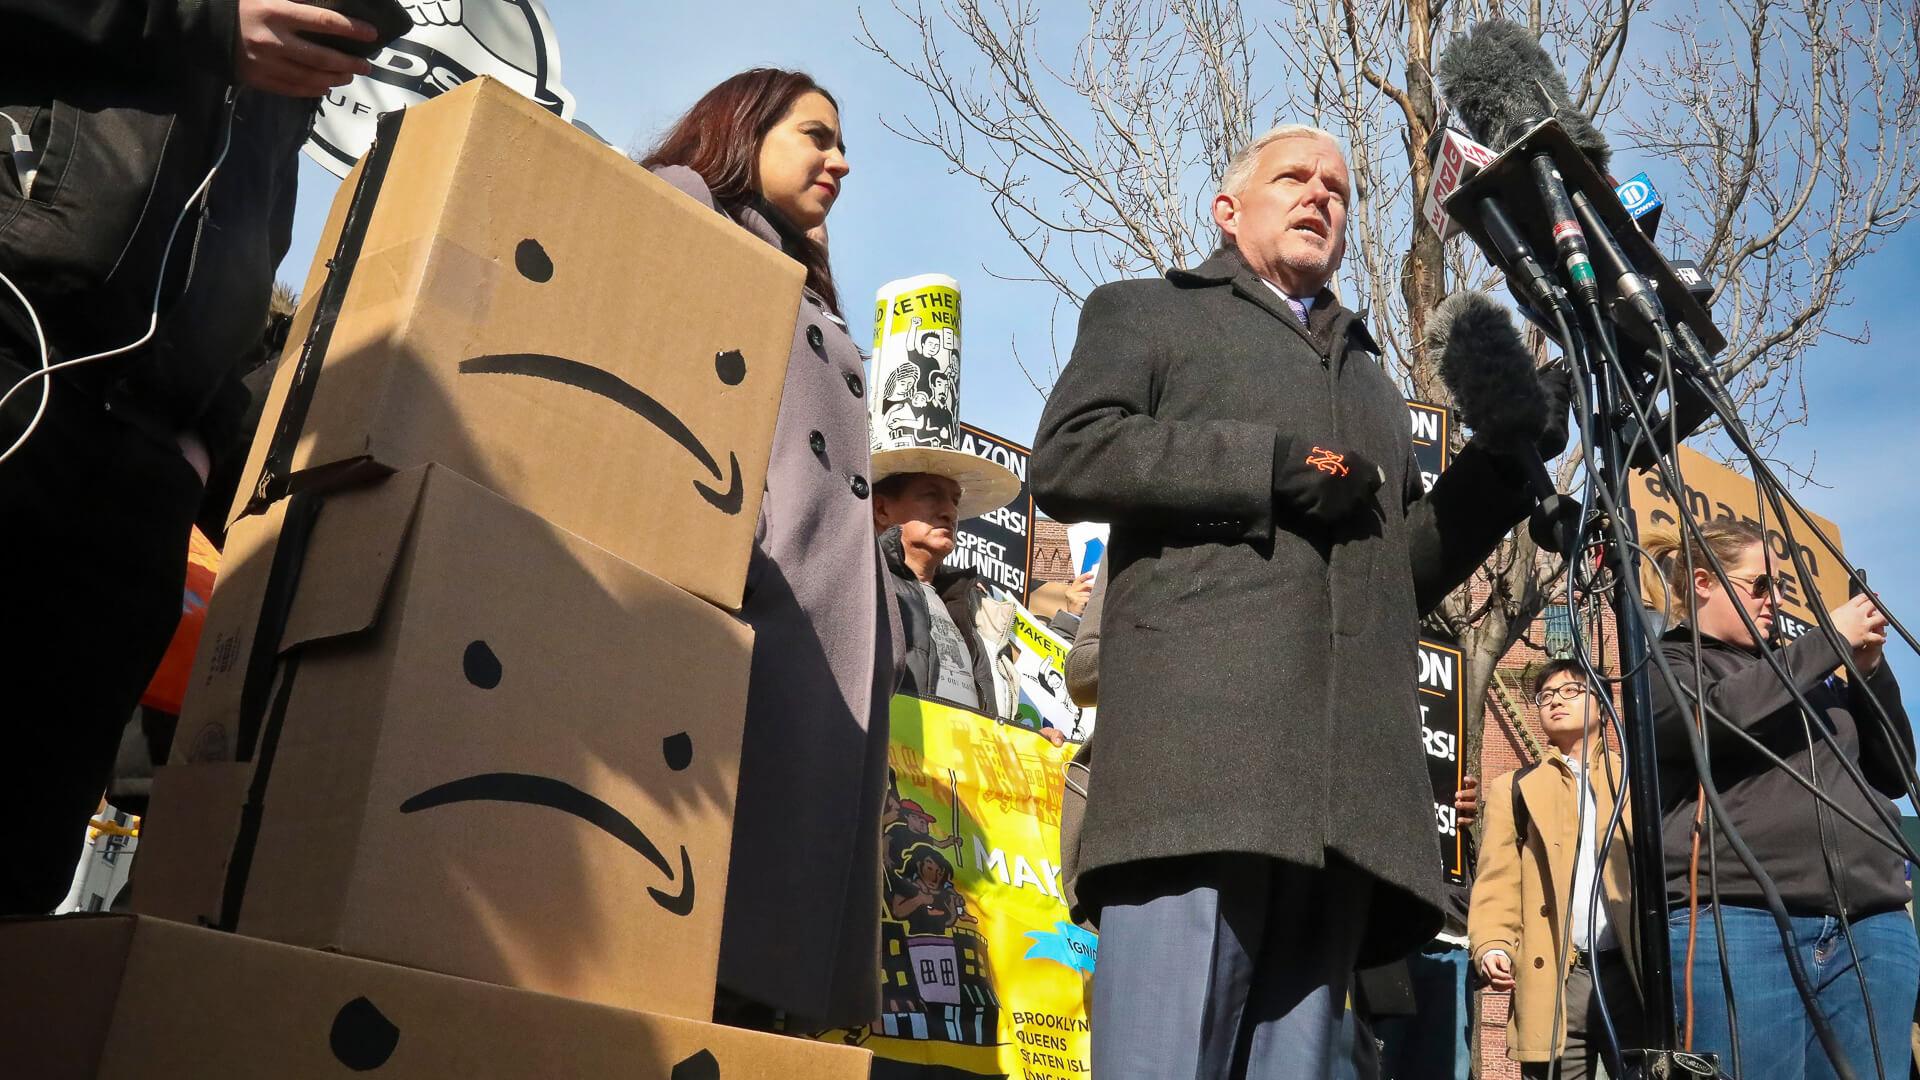 New York City council member Jimmy Van Bramer speaks to crowd